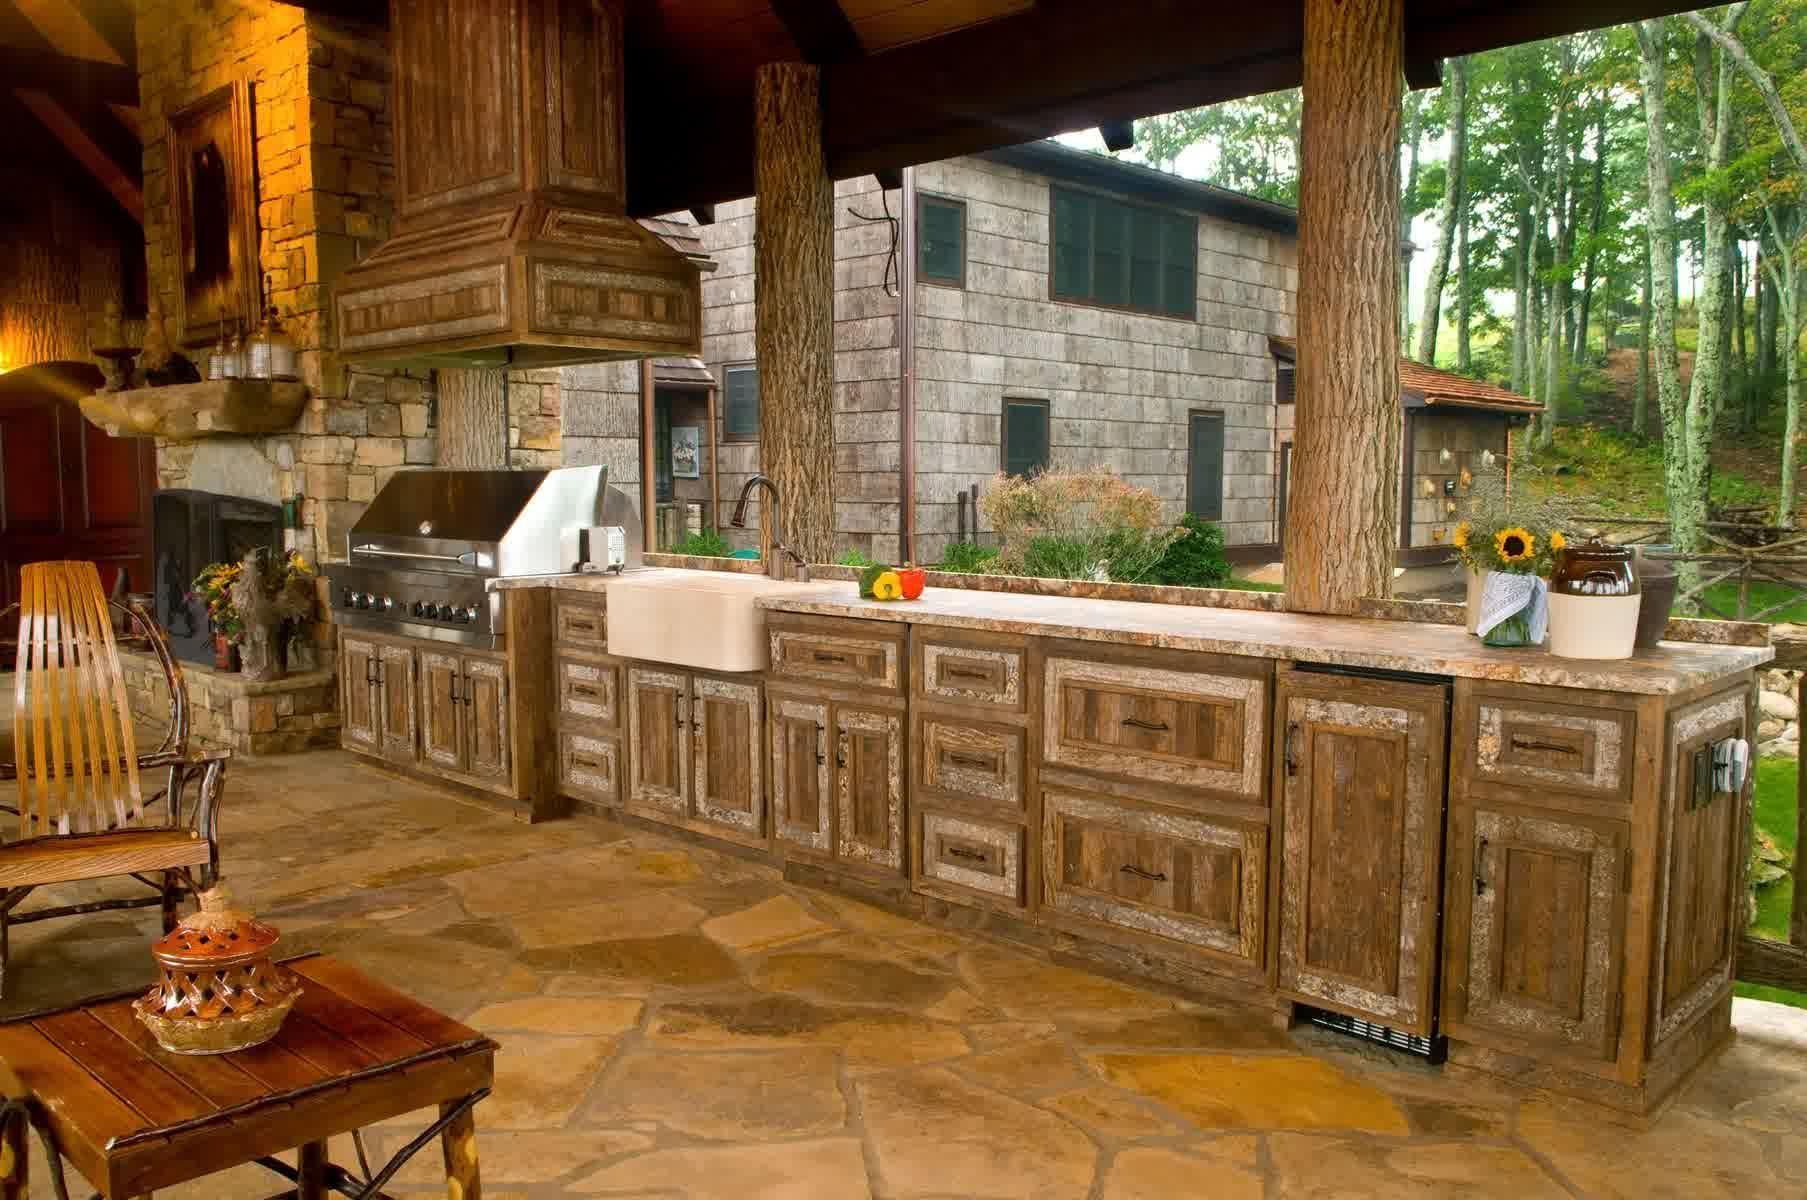 Kitchen Design 20 Rustic Outdoor Home Ideas Outdoor Kitchen Decor Backyard Kitchen Outdoor Kitchen Design